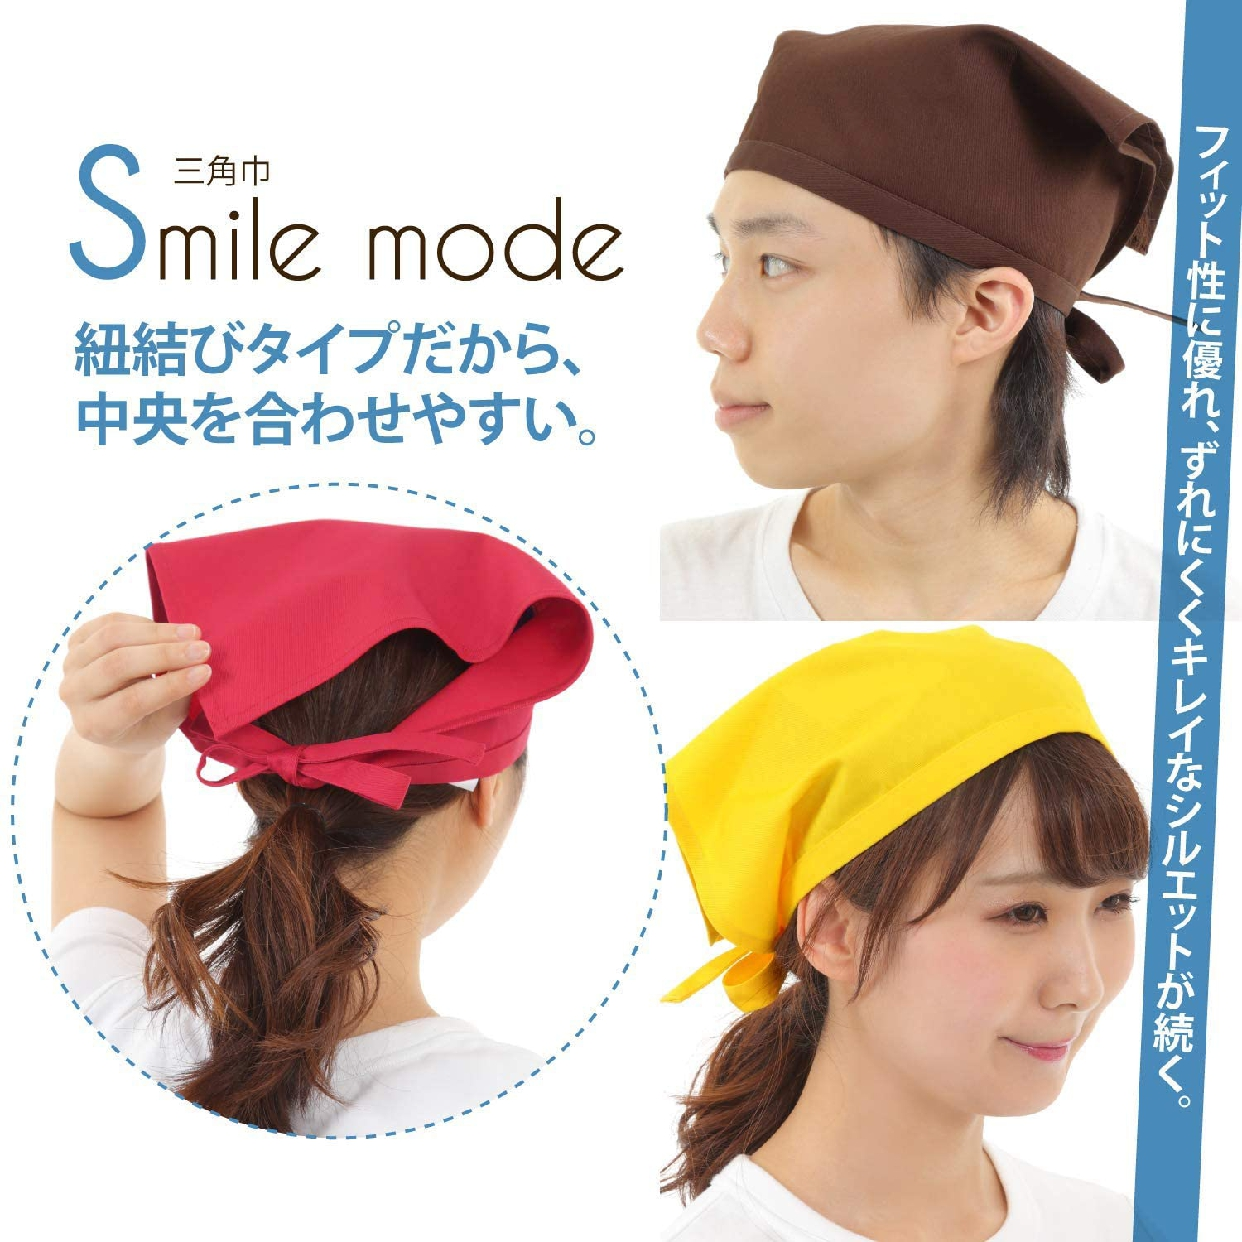 smile mode(スマイル モード) 三角巾の商品画像3